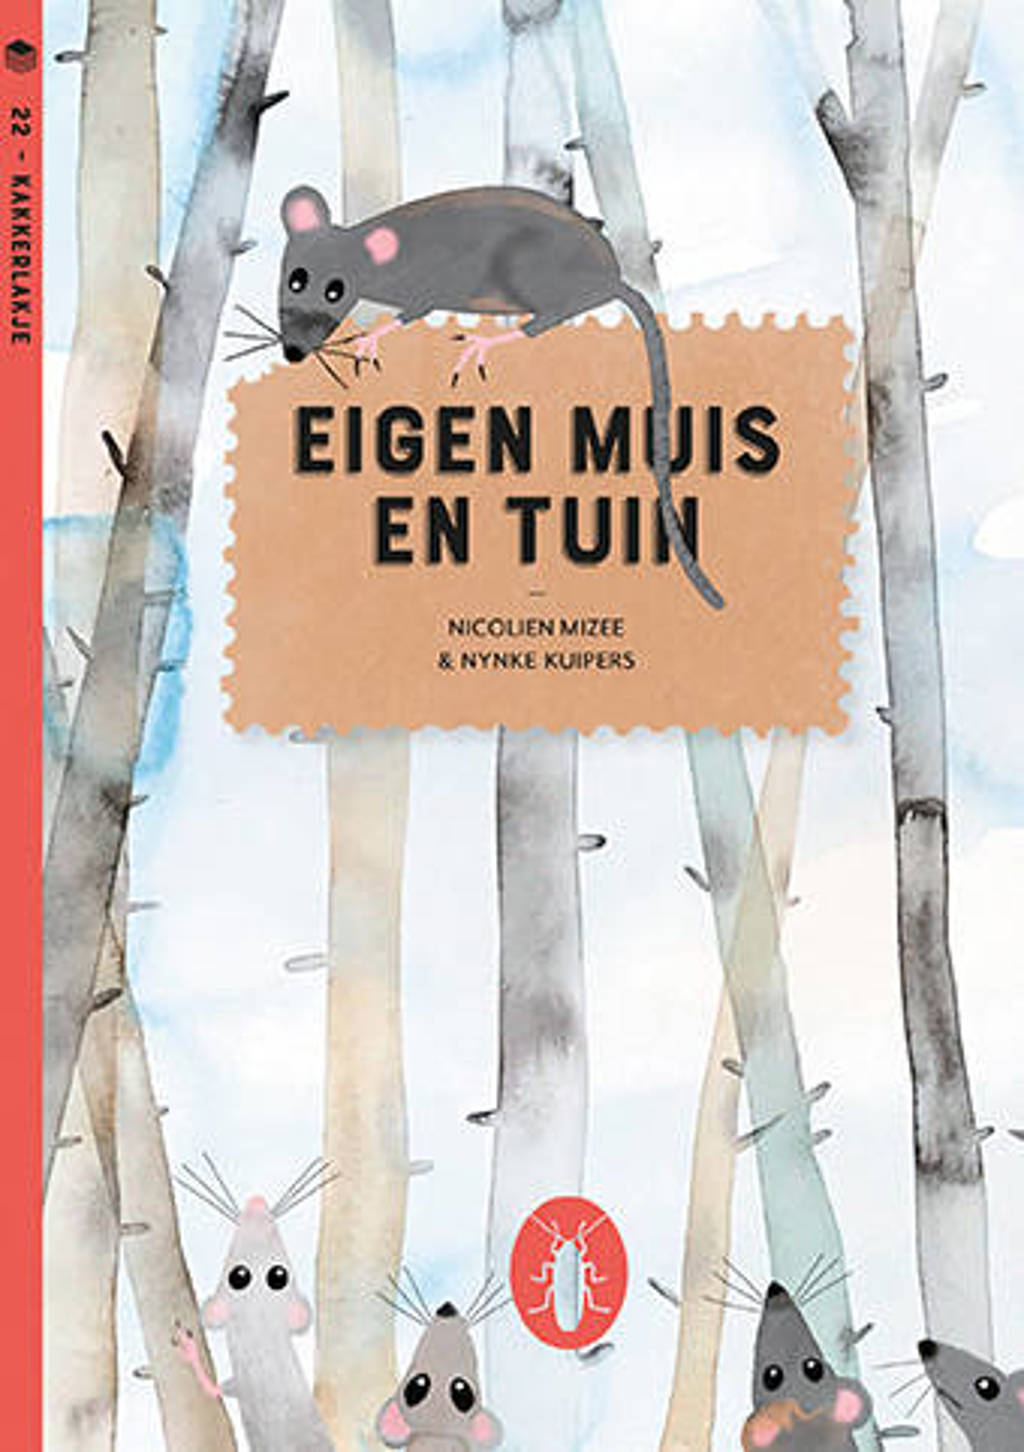 Kakkerlakjes literatuur: Eigen muis en tuin (set van 6) - Nicolien Mizee